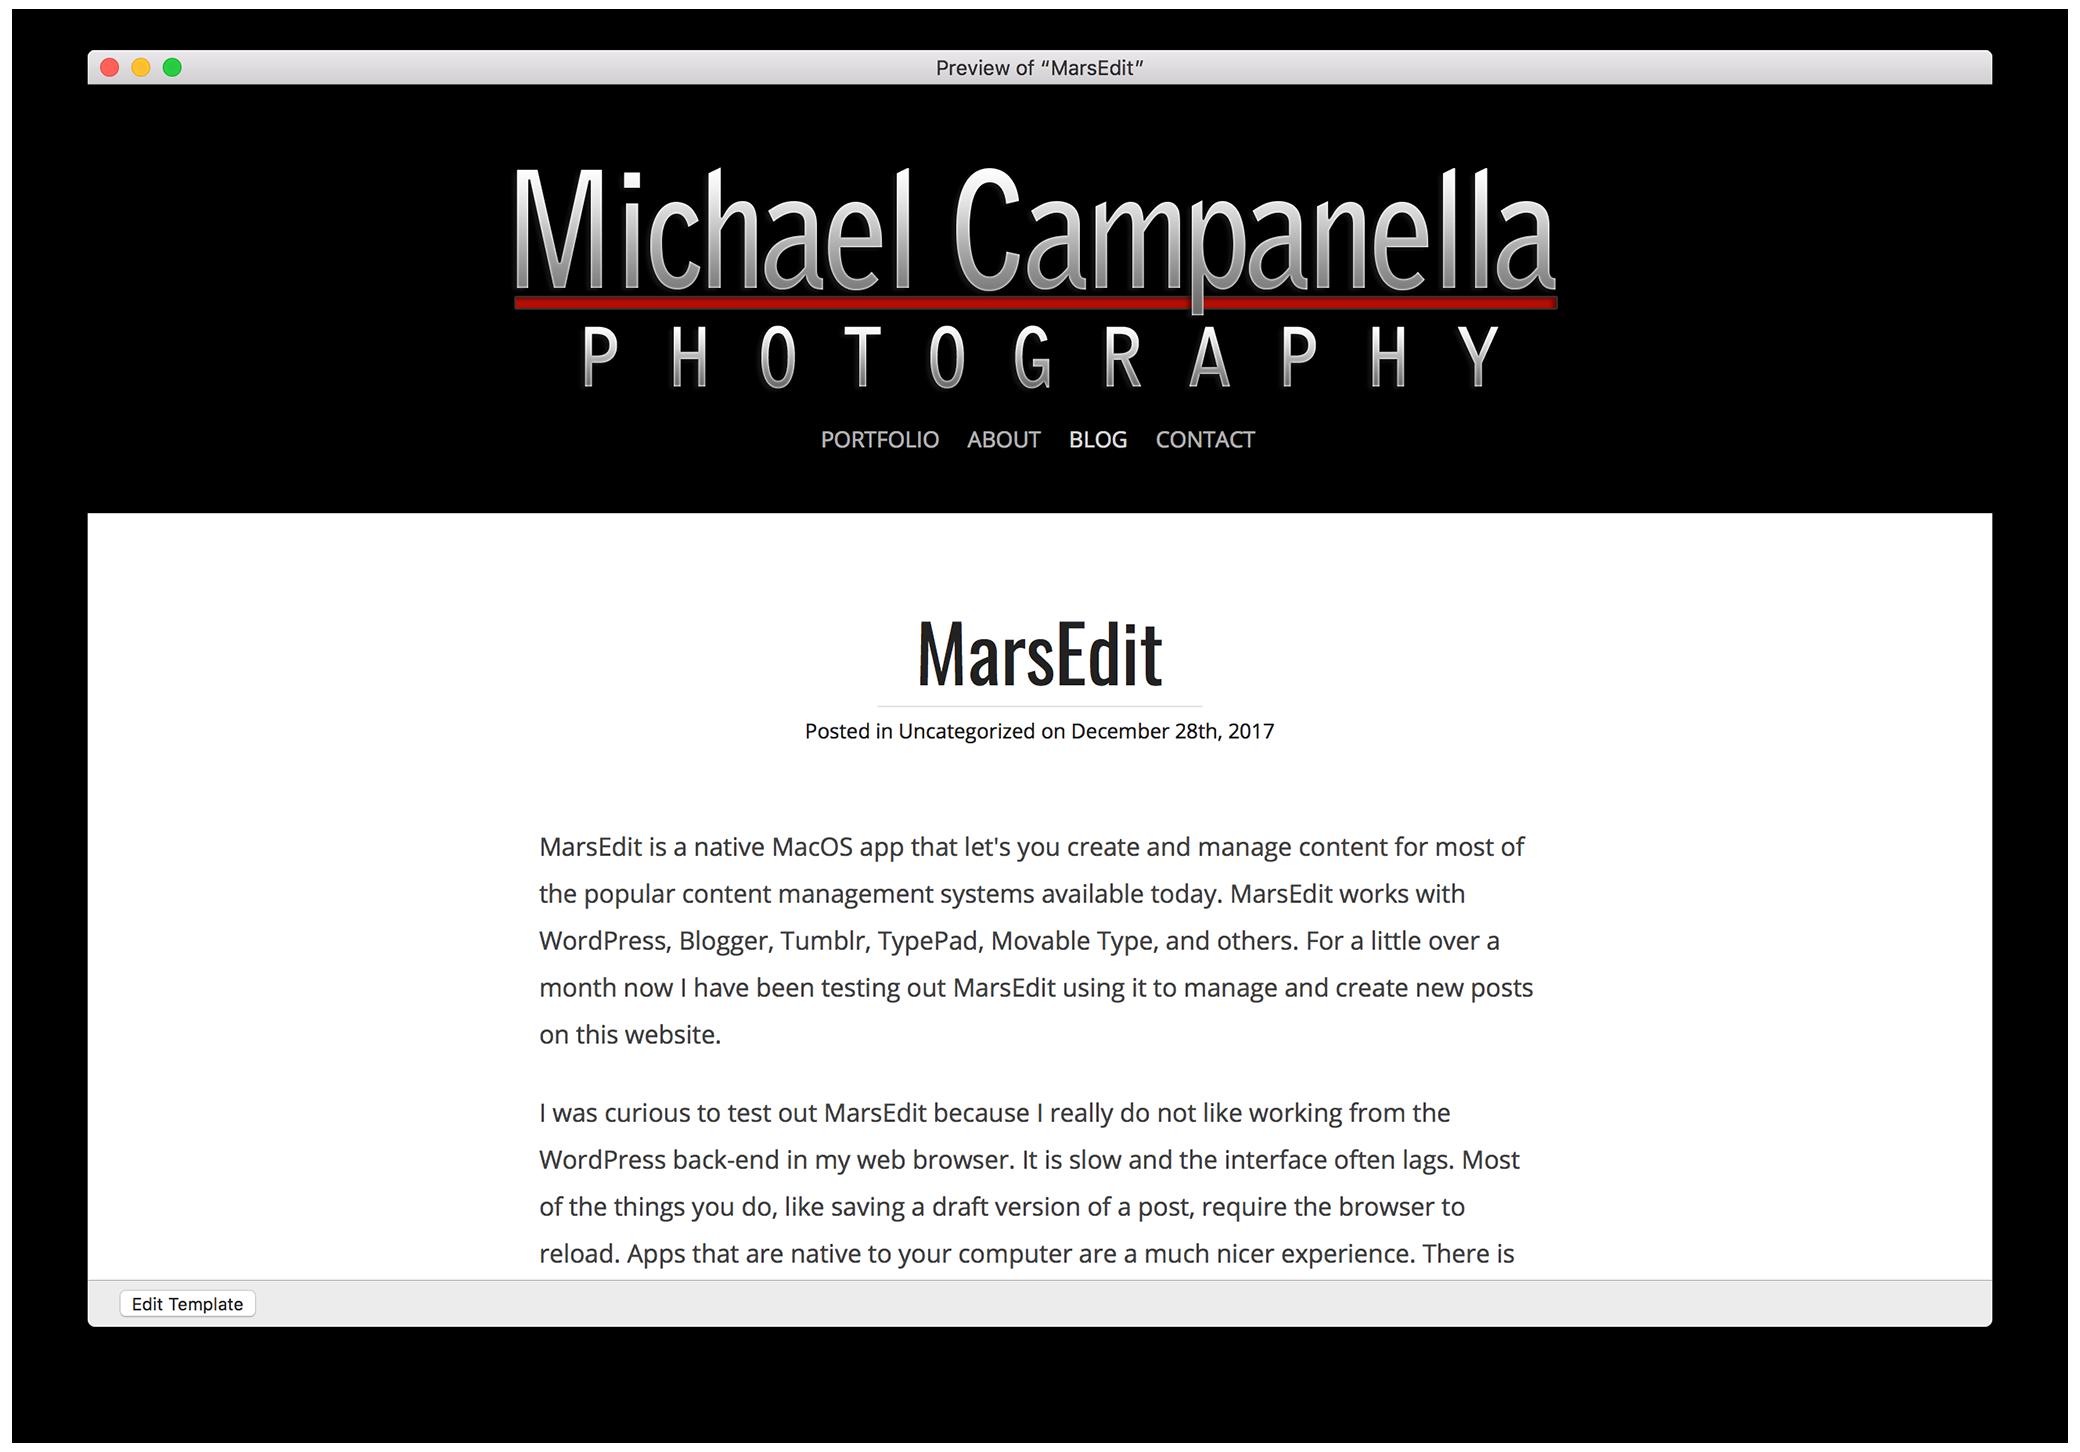 MarsEdit: Preview template window